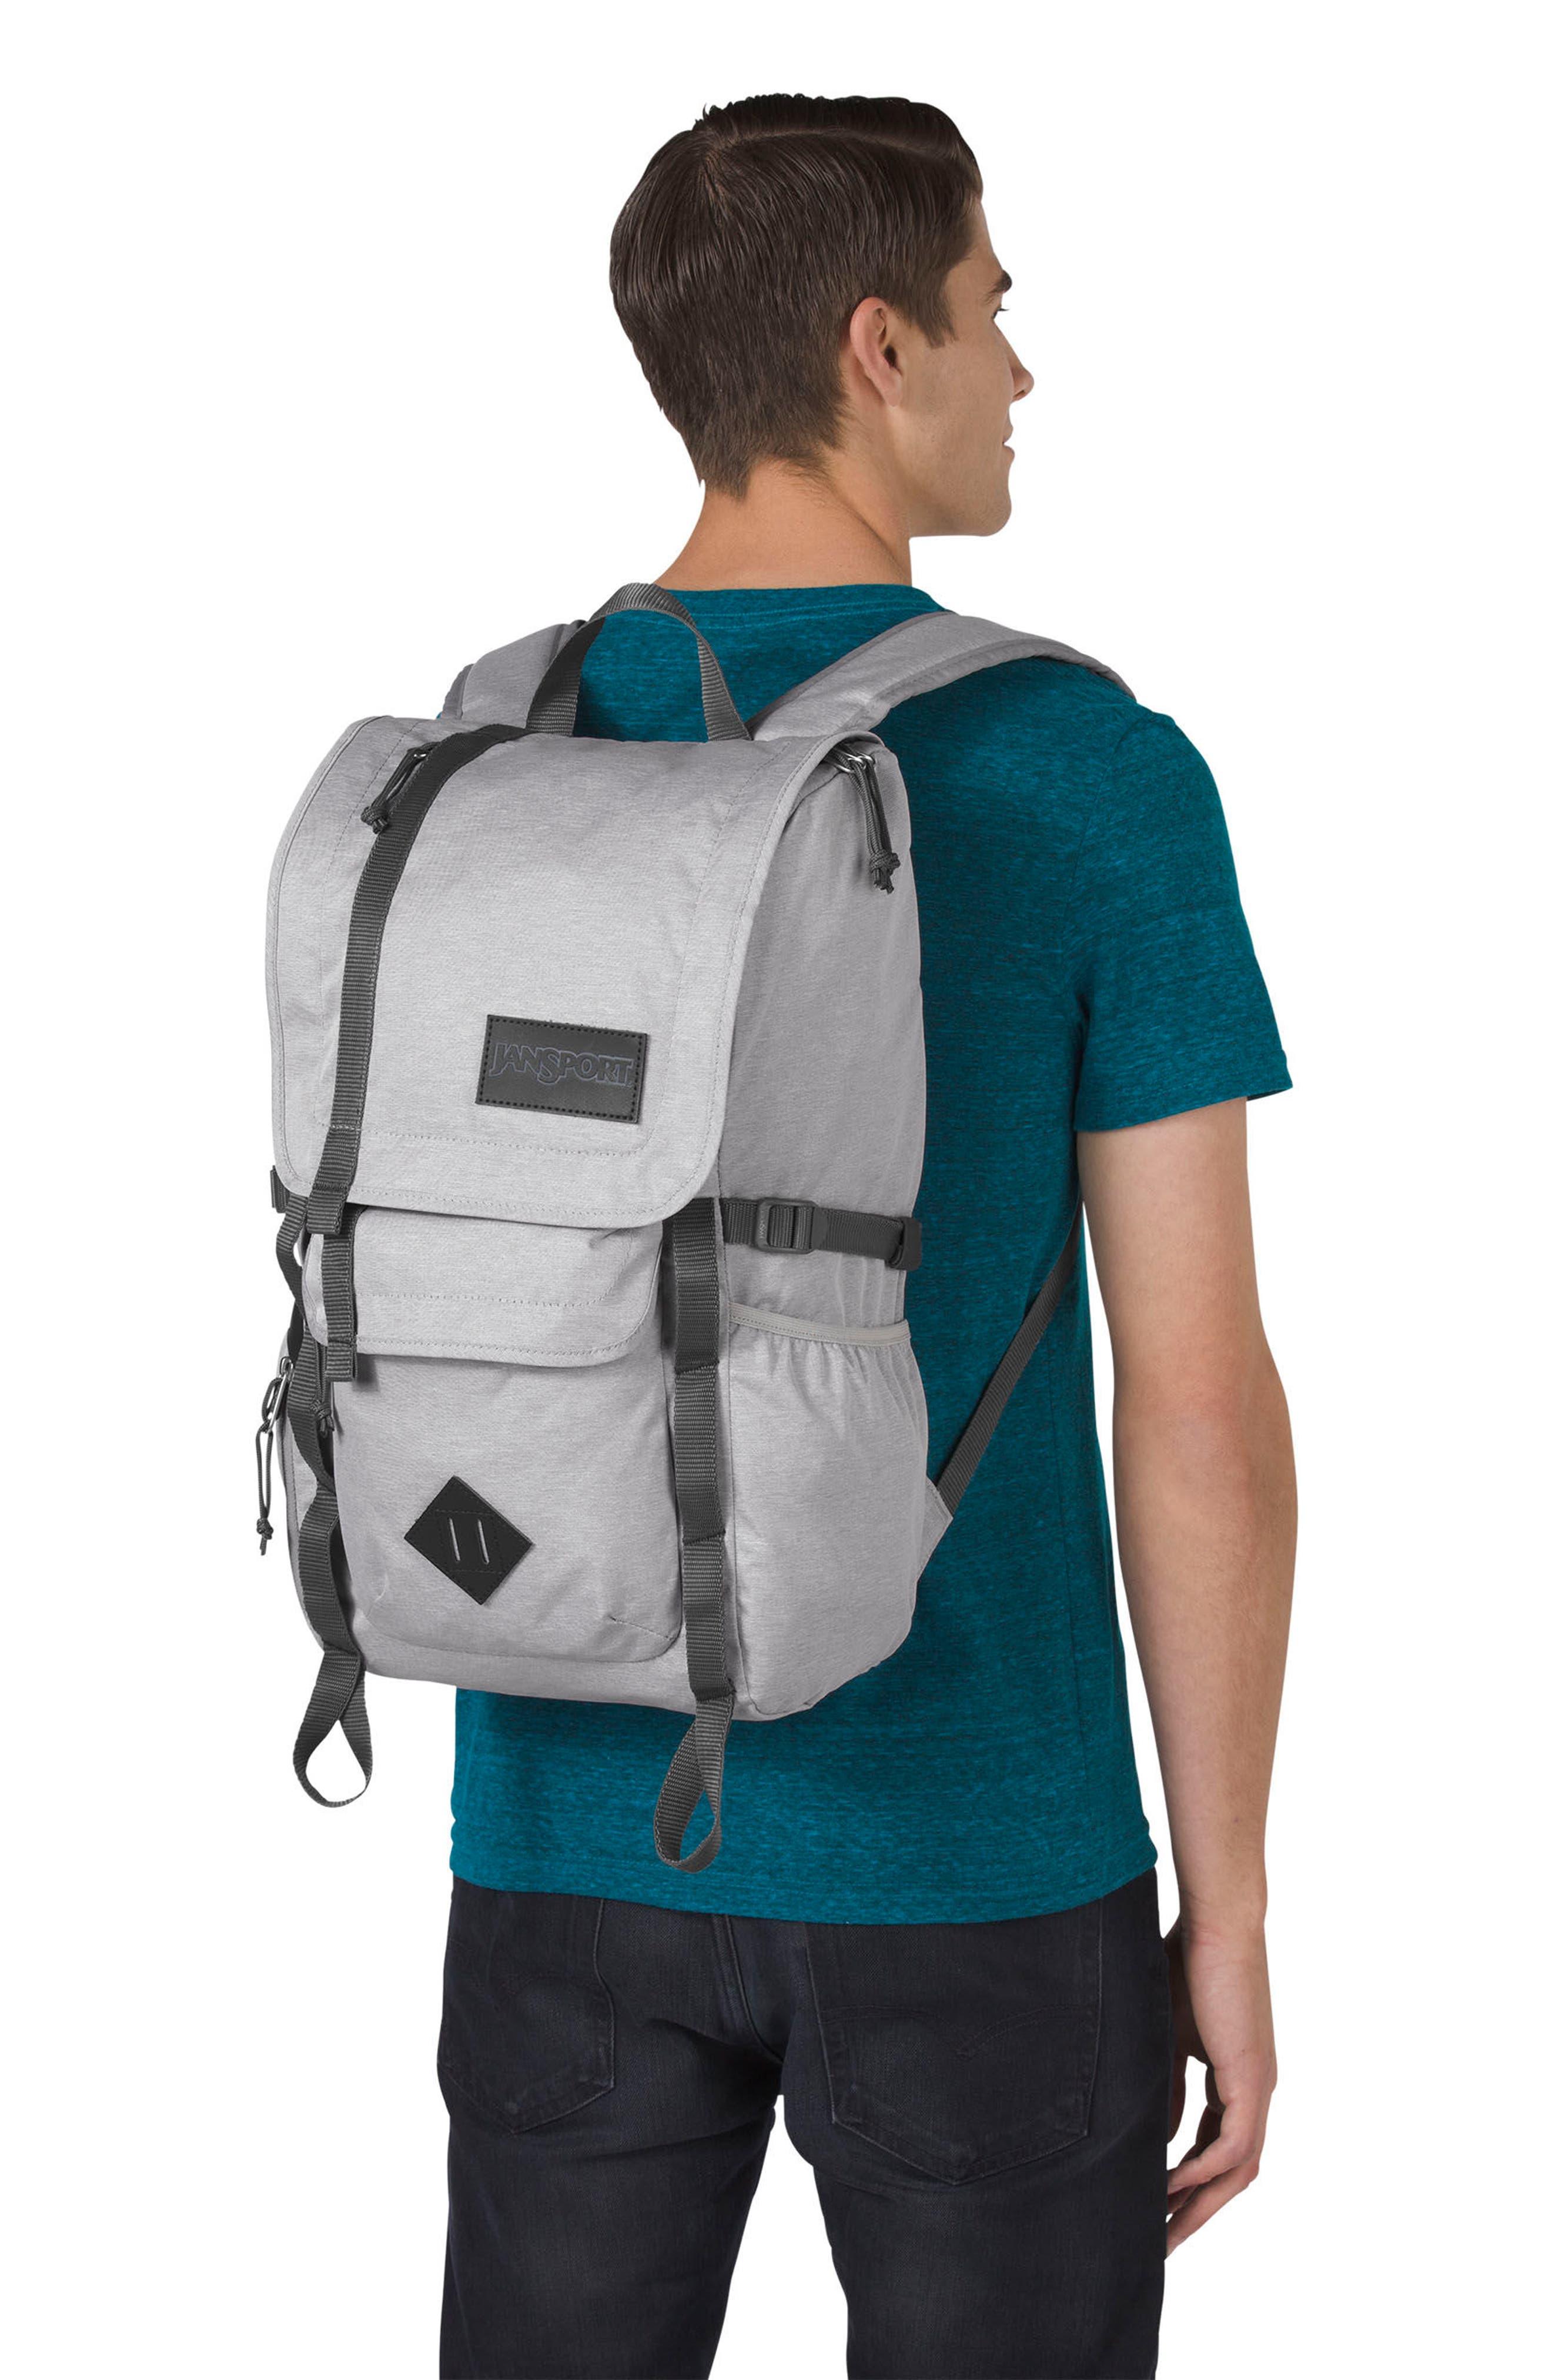 Hatchet Backpack,                             Alternate thumbnail 6, color,                             090